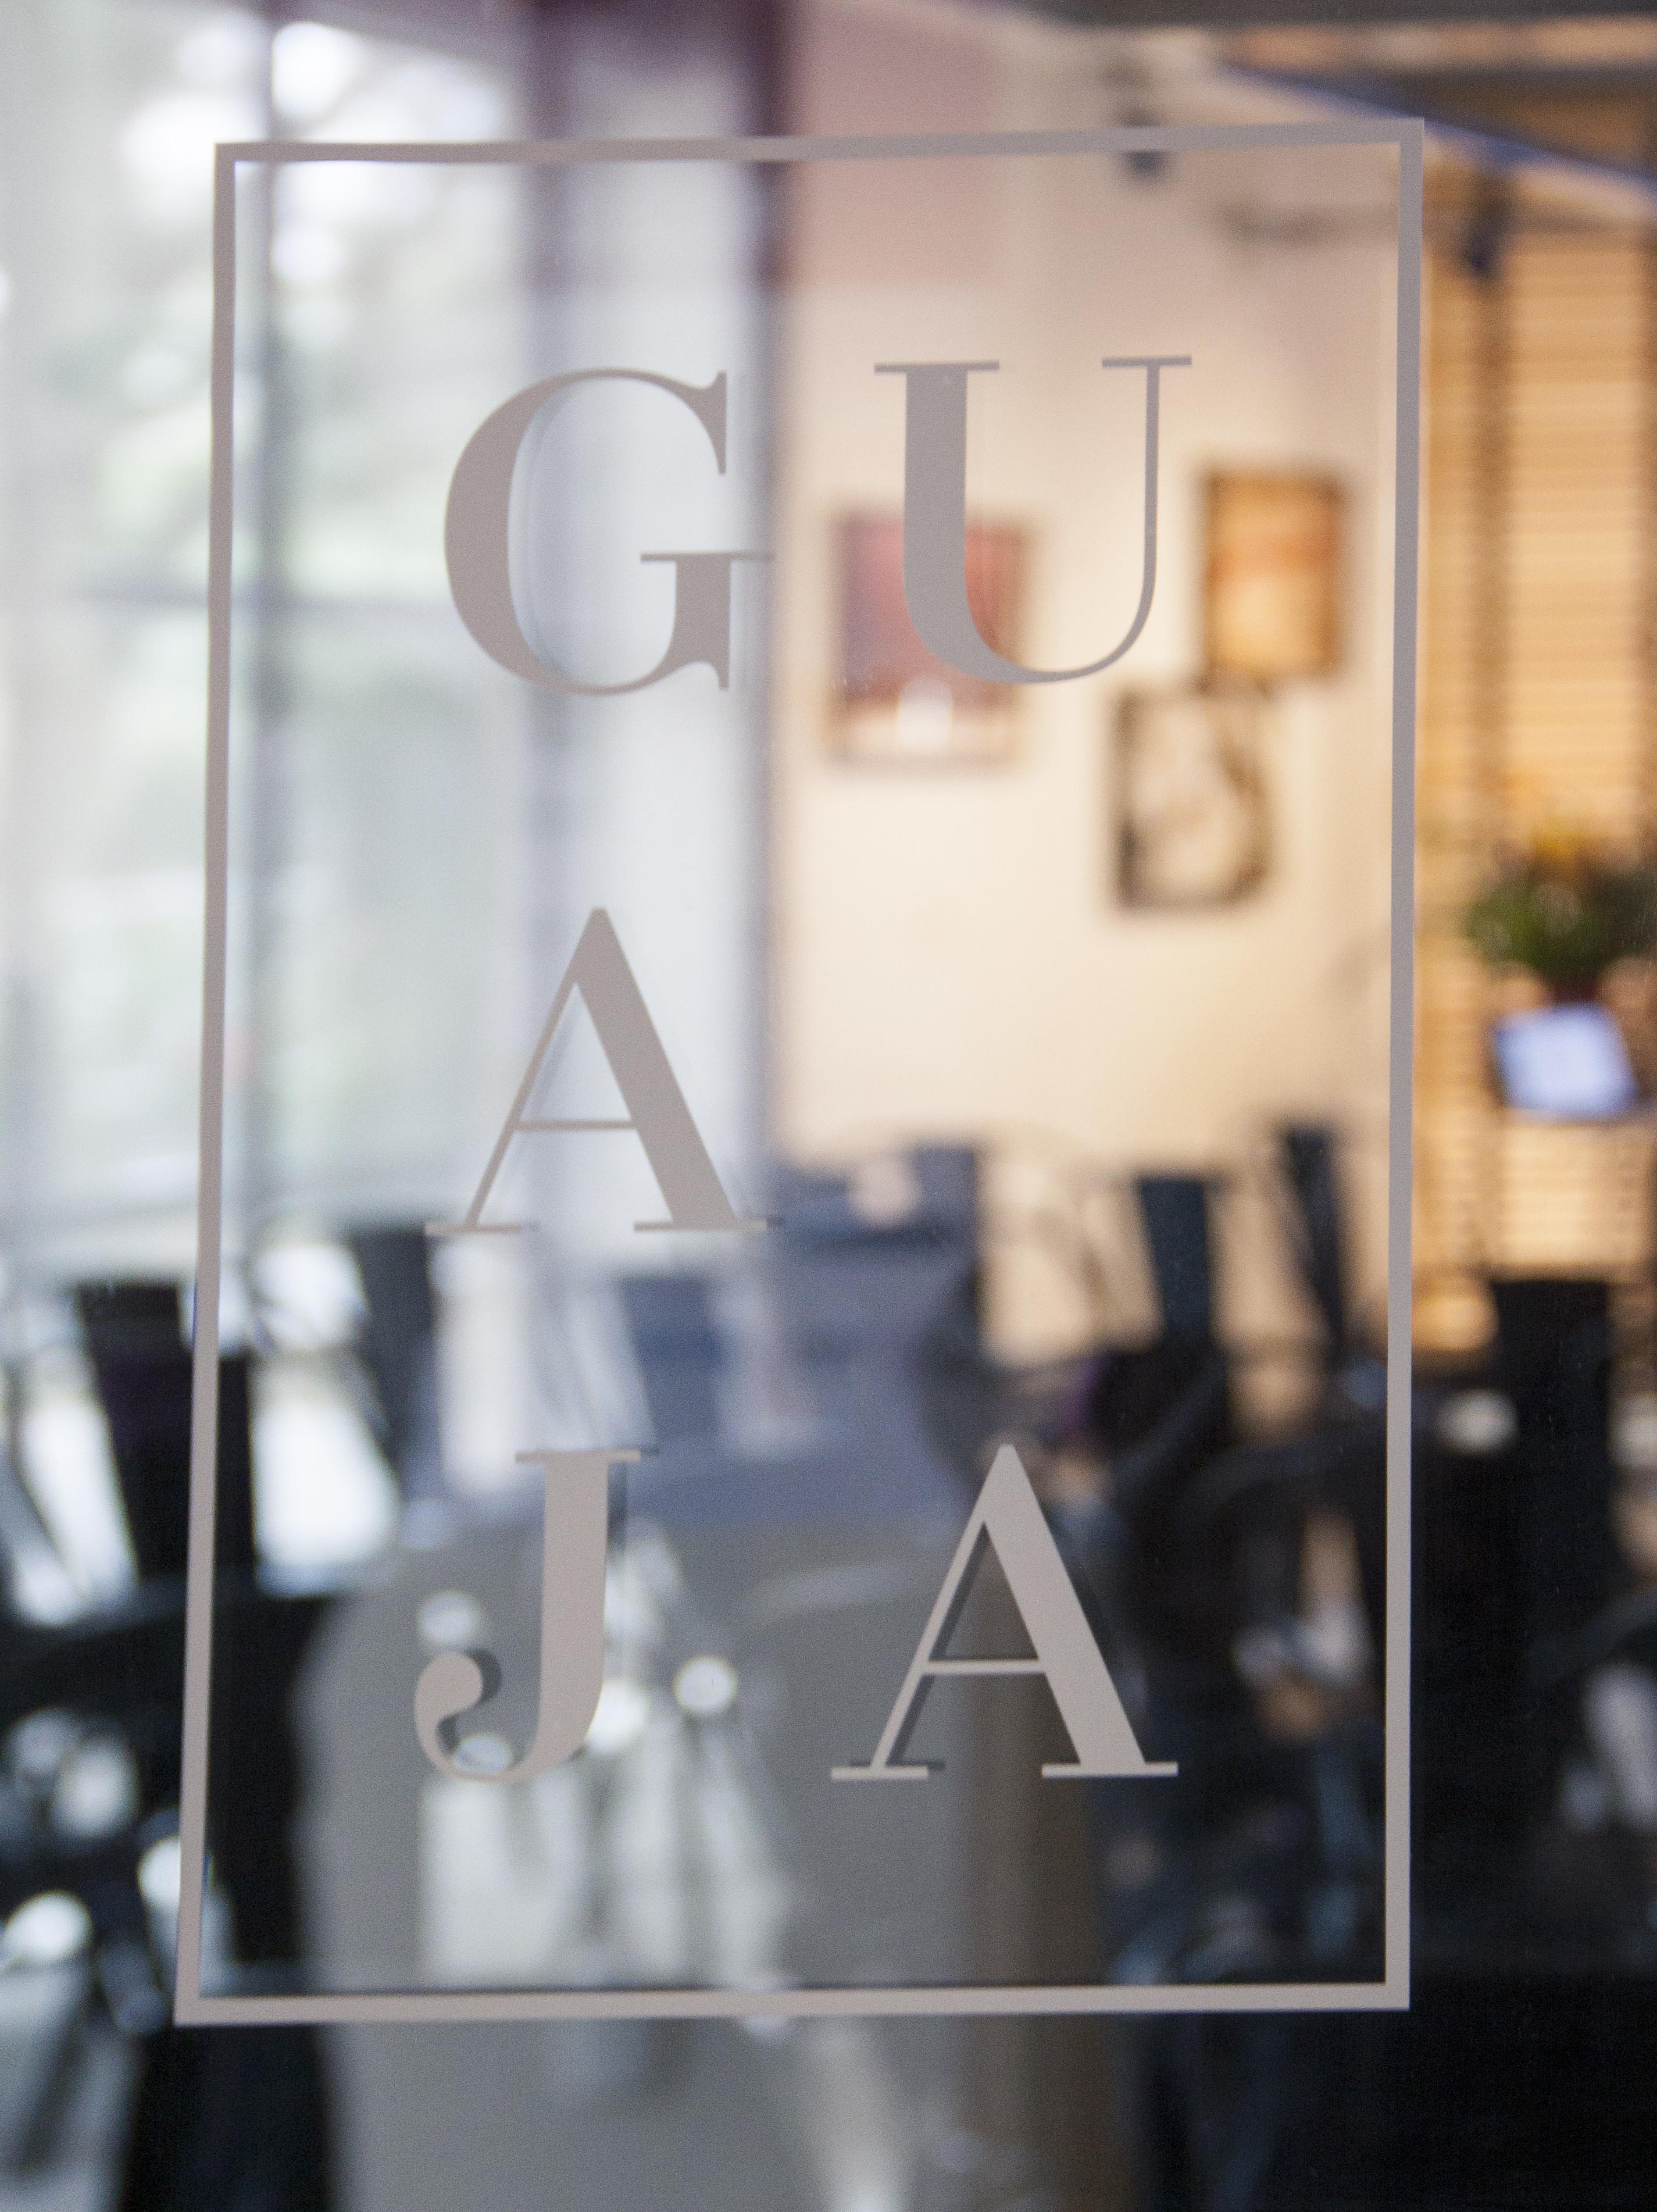 guaja_18